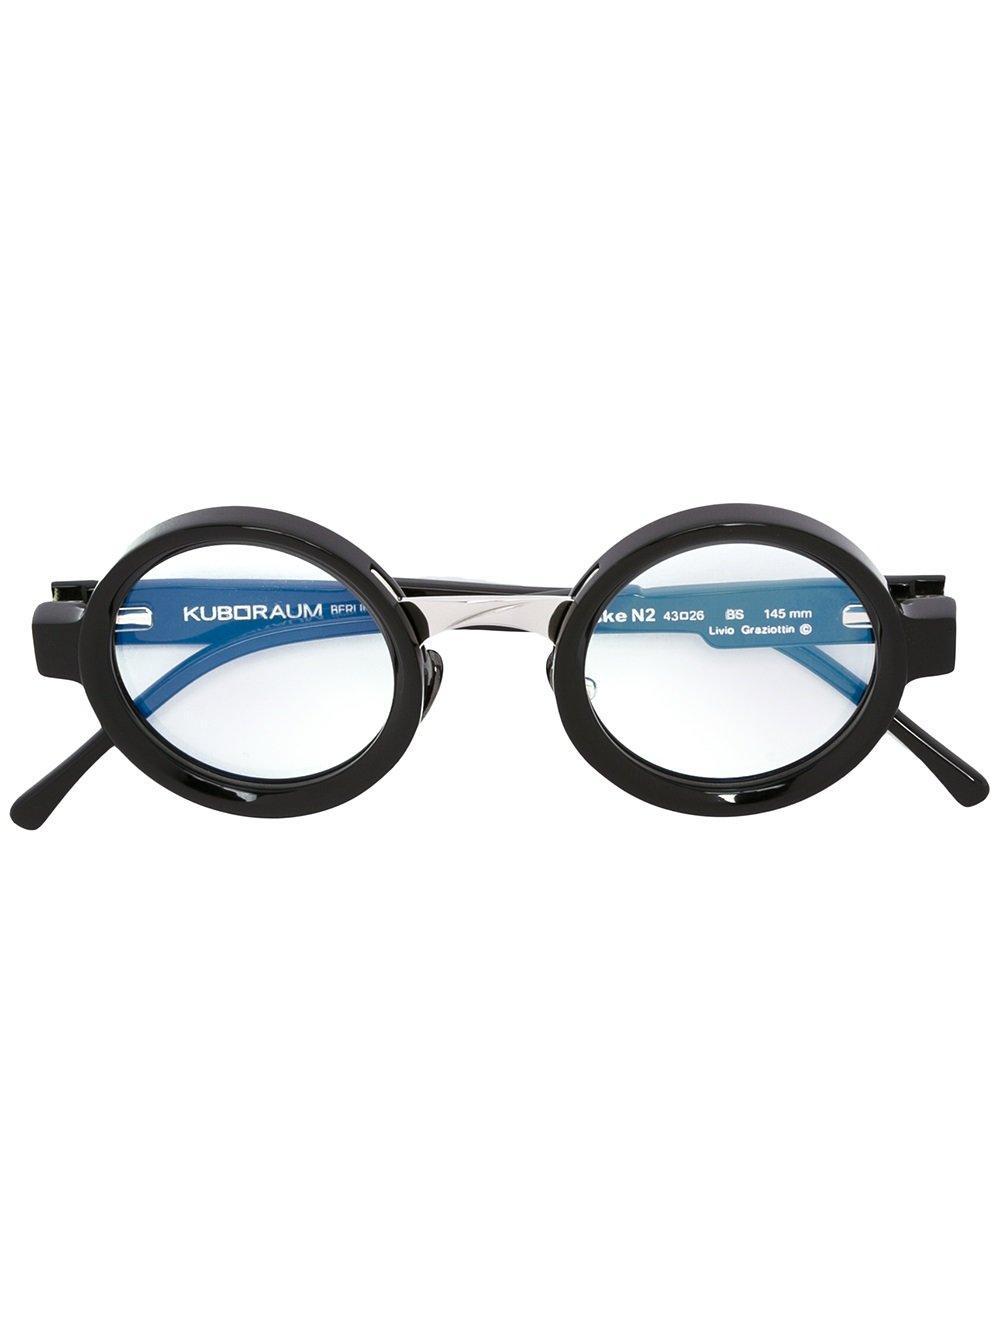 Kuboraum Round Frame Glasses In Black